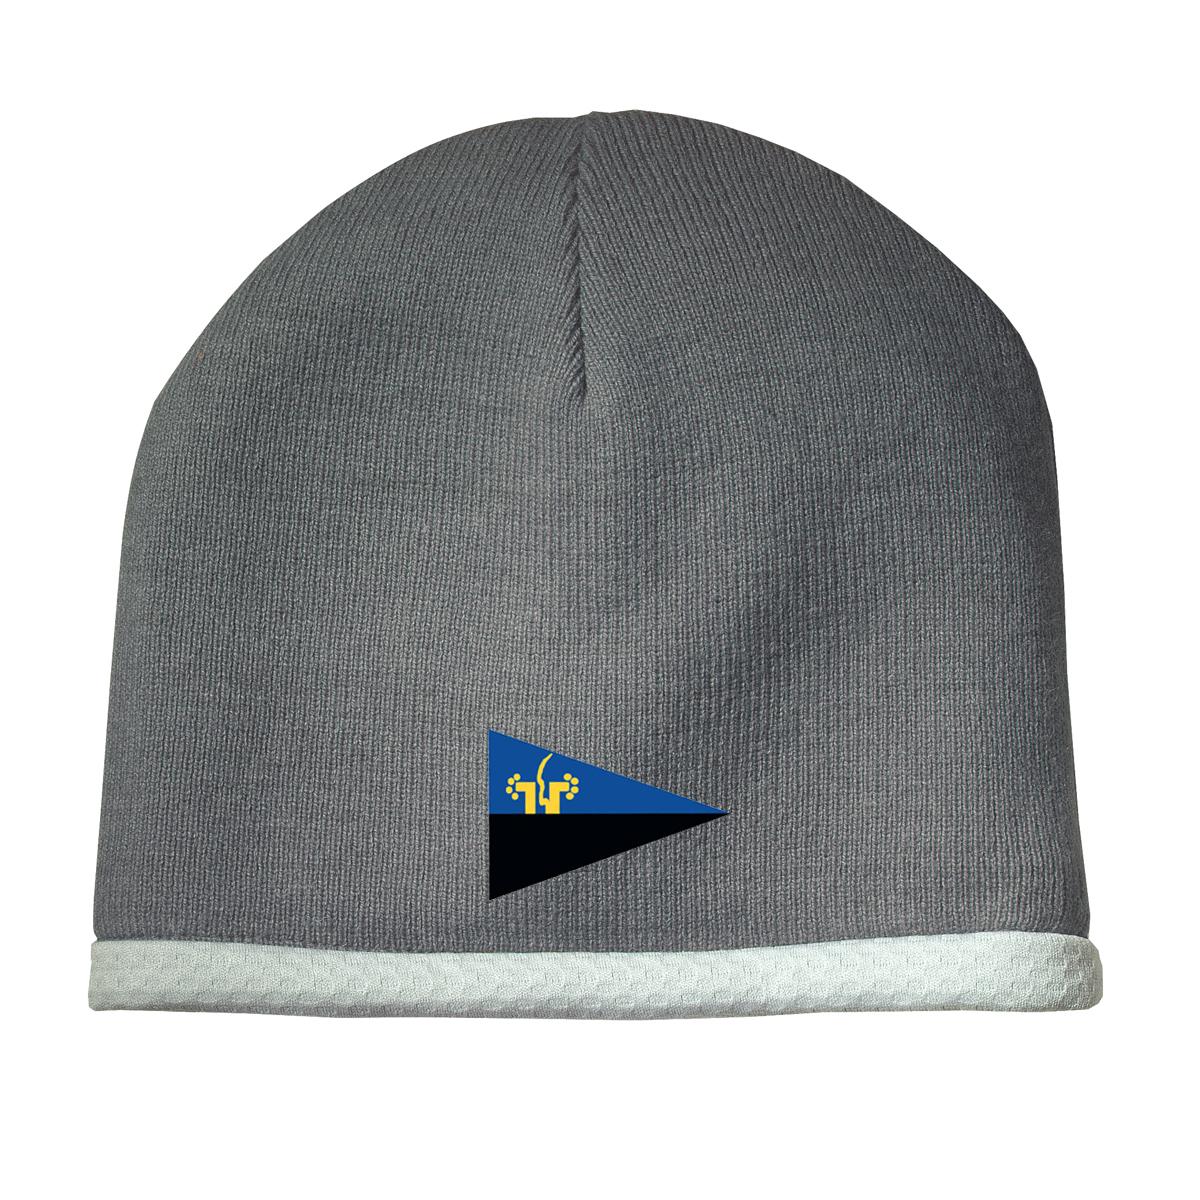 Mudratz Knit Cap